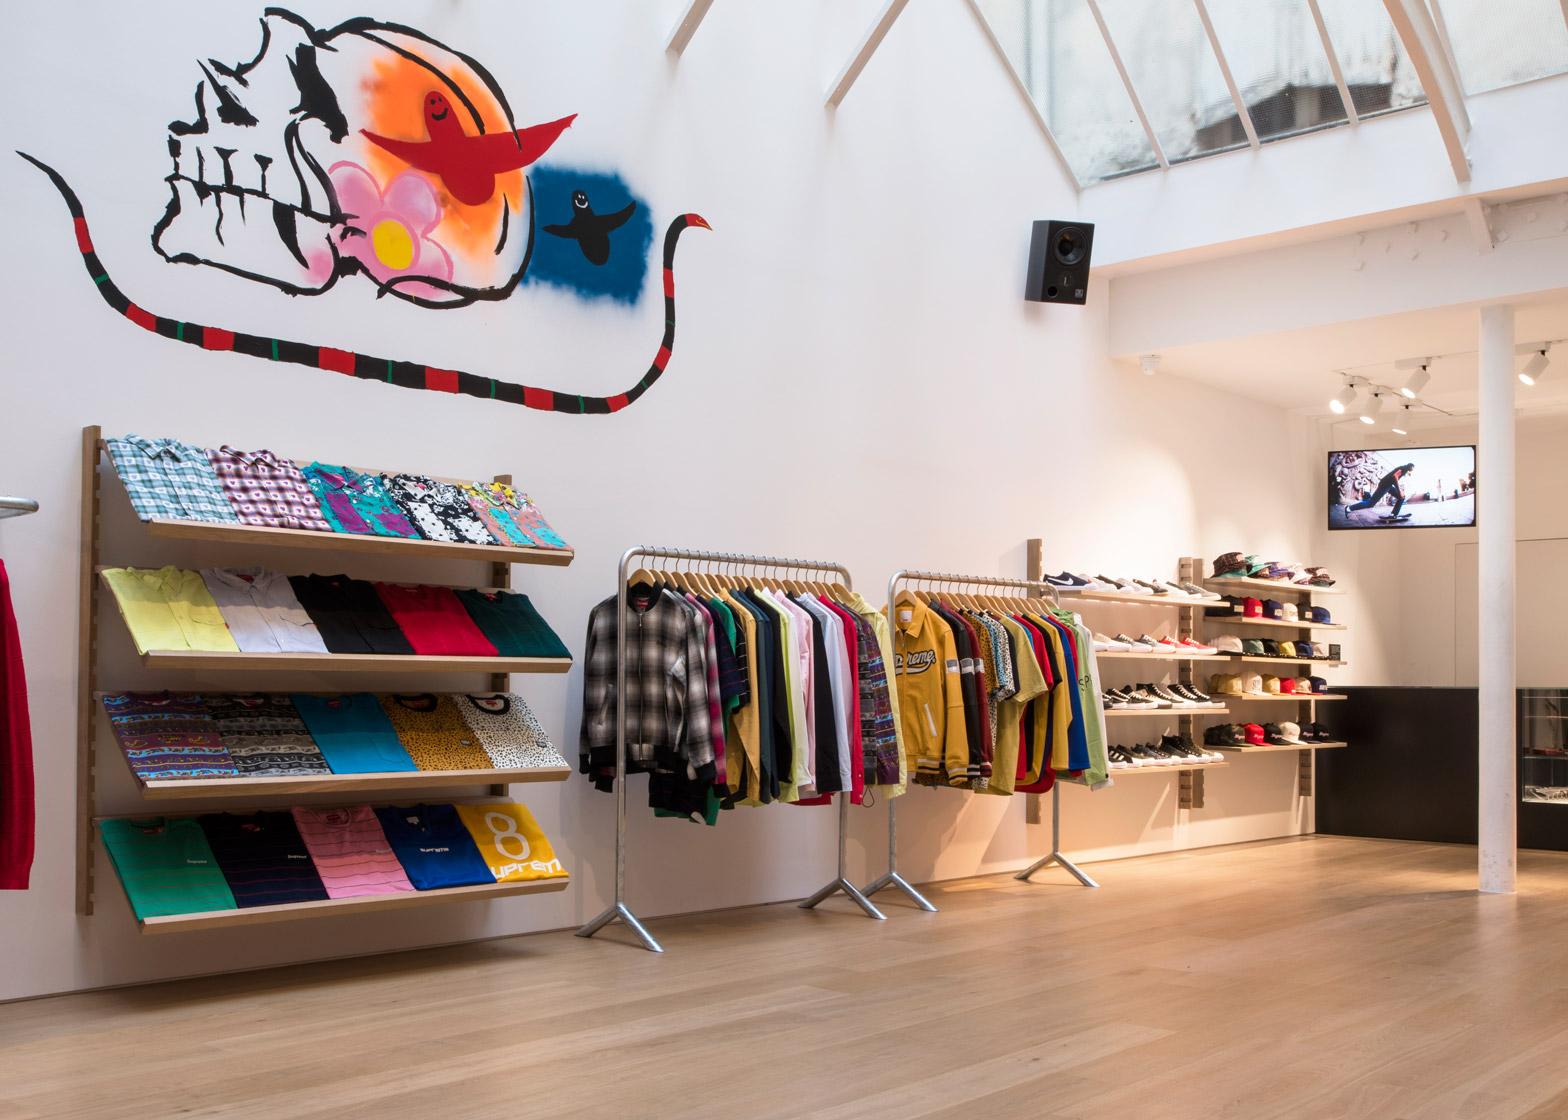 Brinkworth designs clean interior for Supreme Paris store 347984ac23